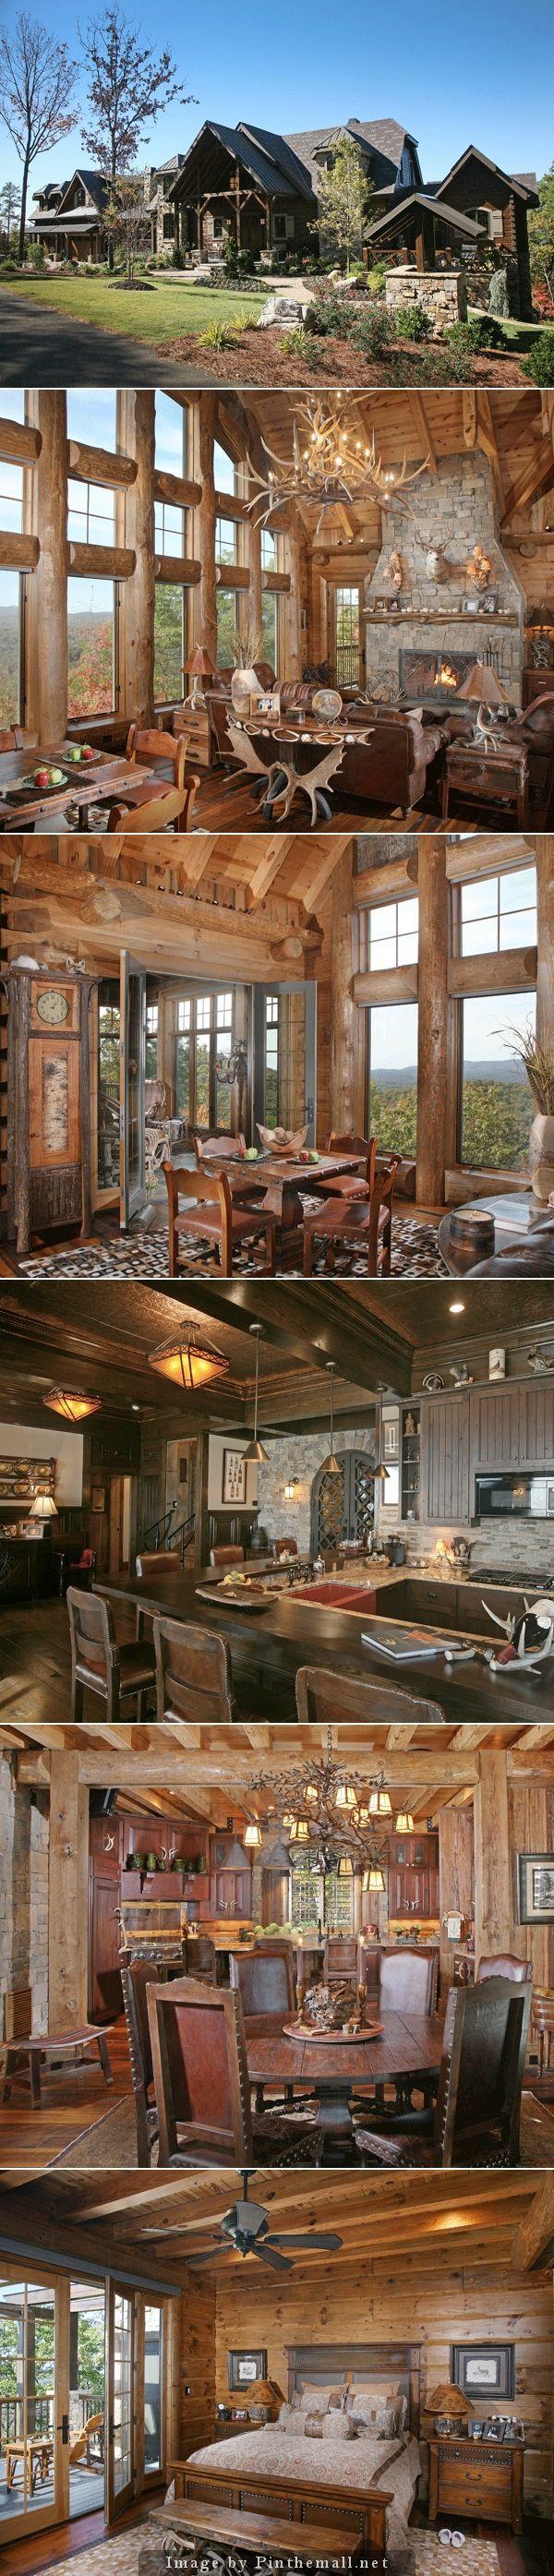 Log Home Beauty - created via http://pinthemall.net: